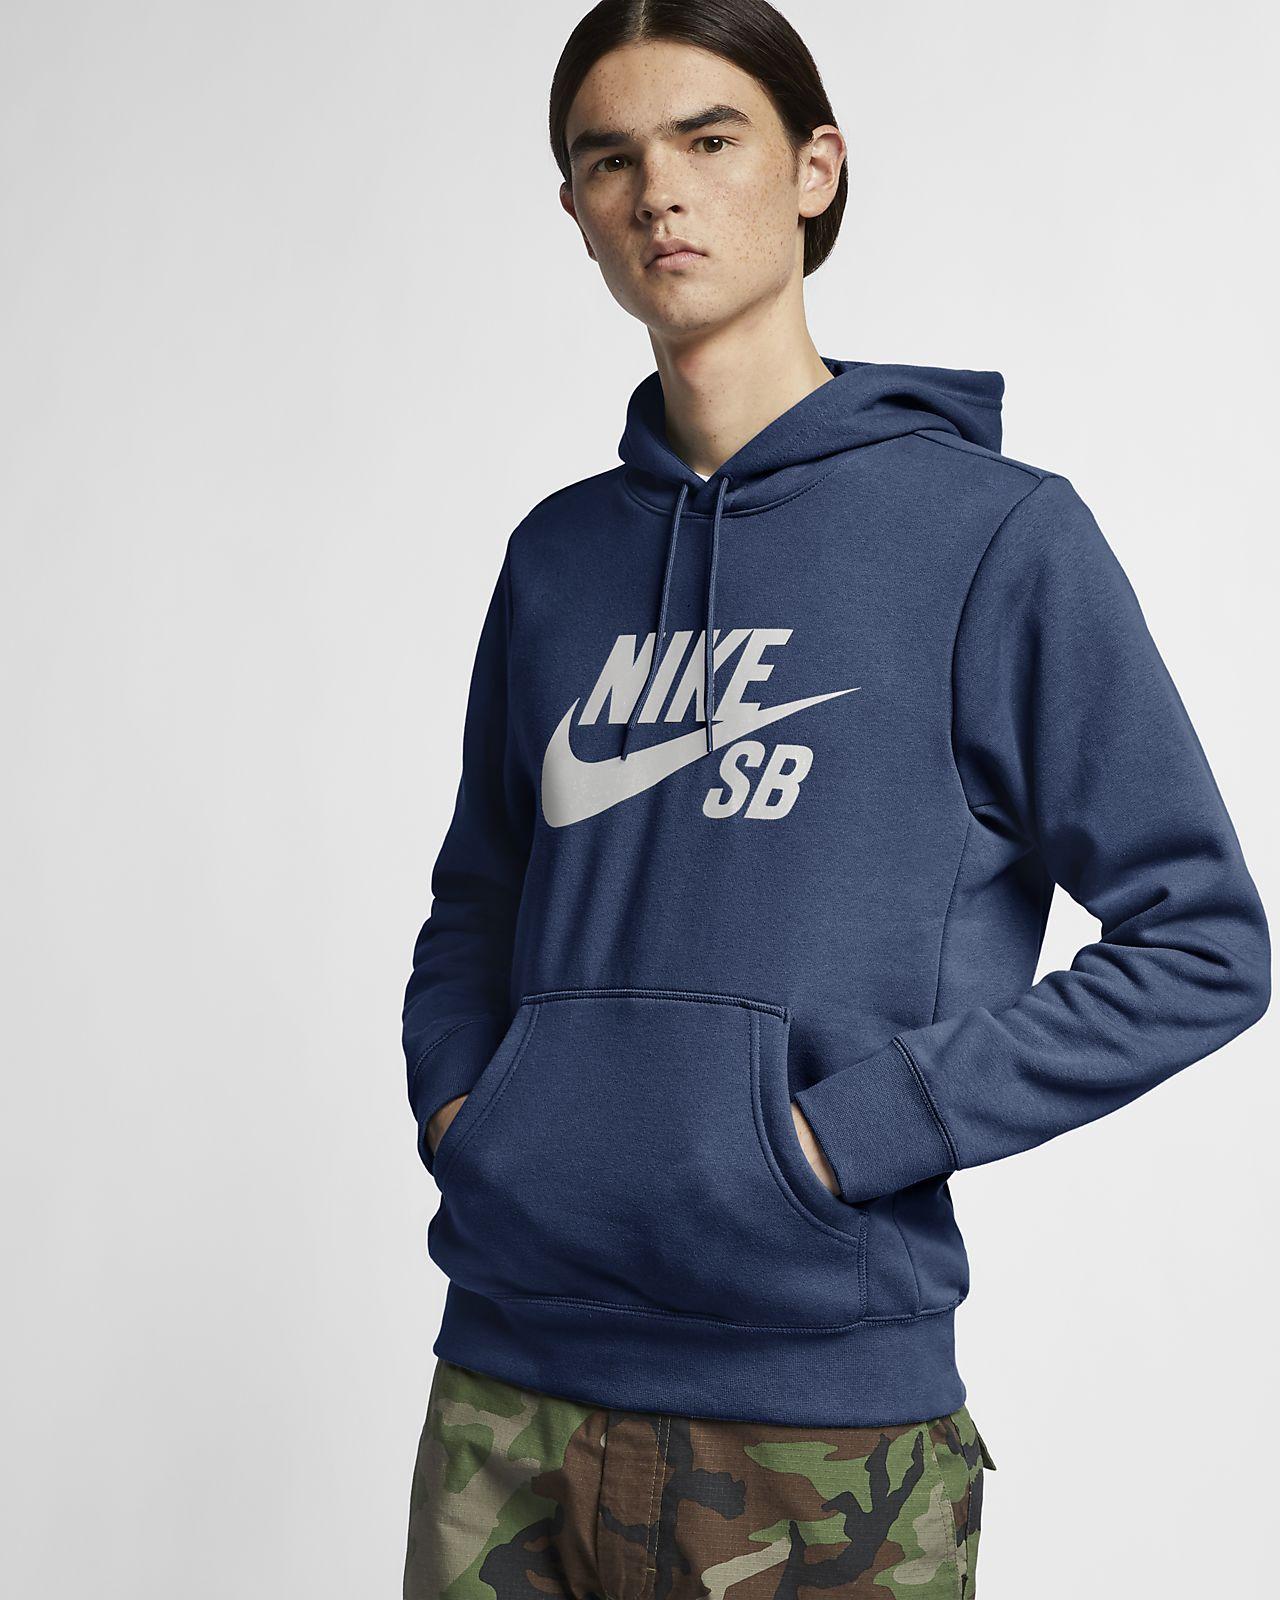 Nike Sb Icon Pullover Skate Hoodie Nike Com Nike Hoodies For Men Nike Sb Hoodies [ 1600 x 1280 Pixel ]